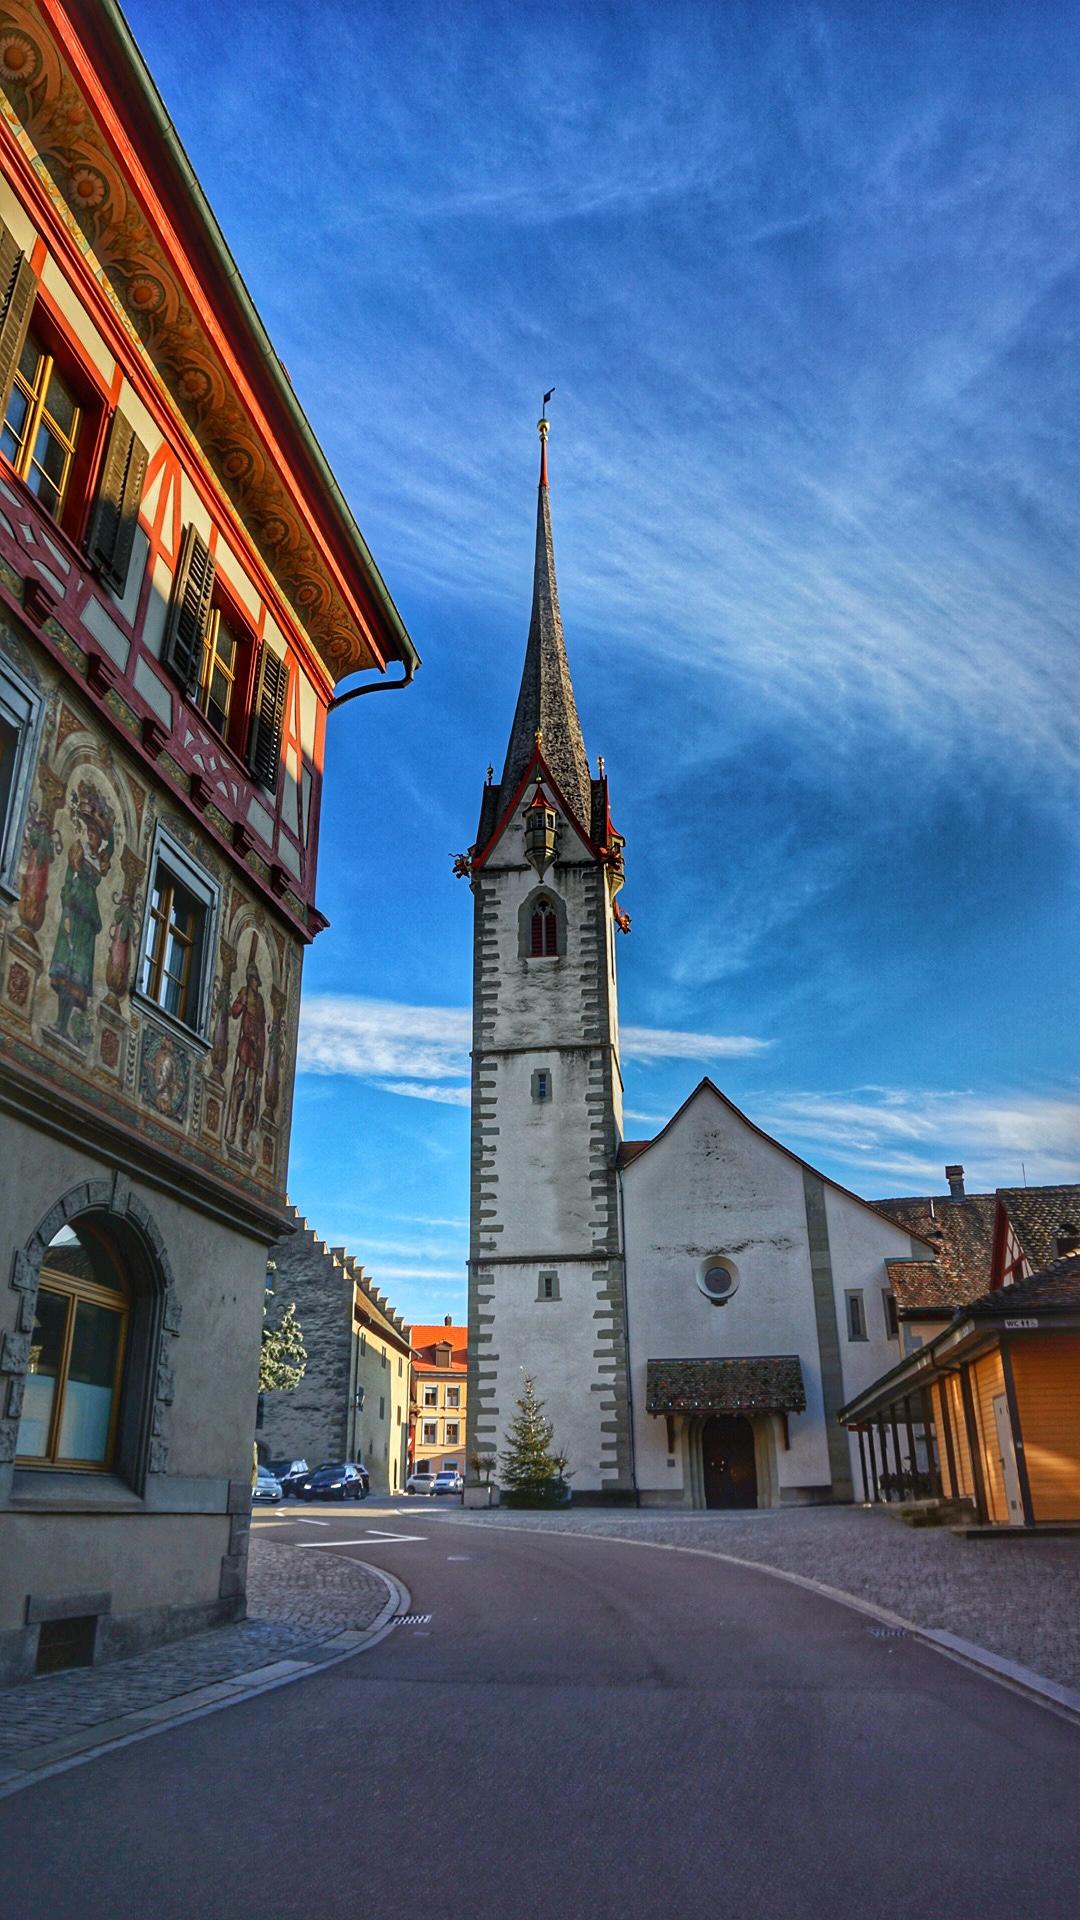 Most beautiful town in Switzerland